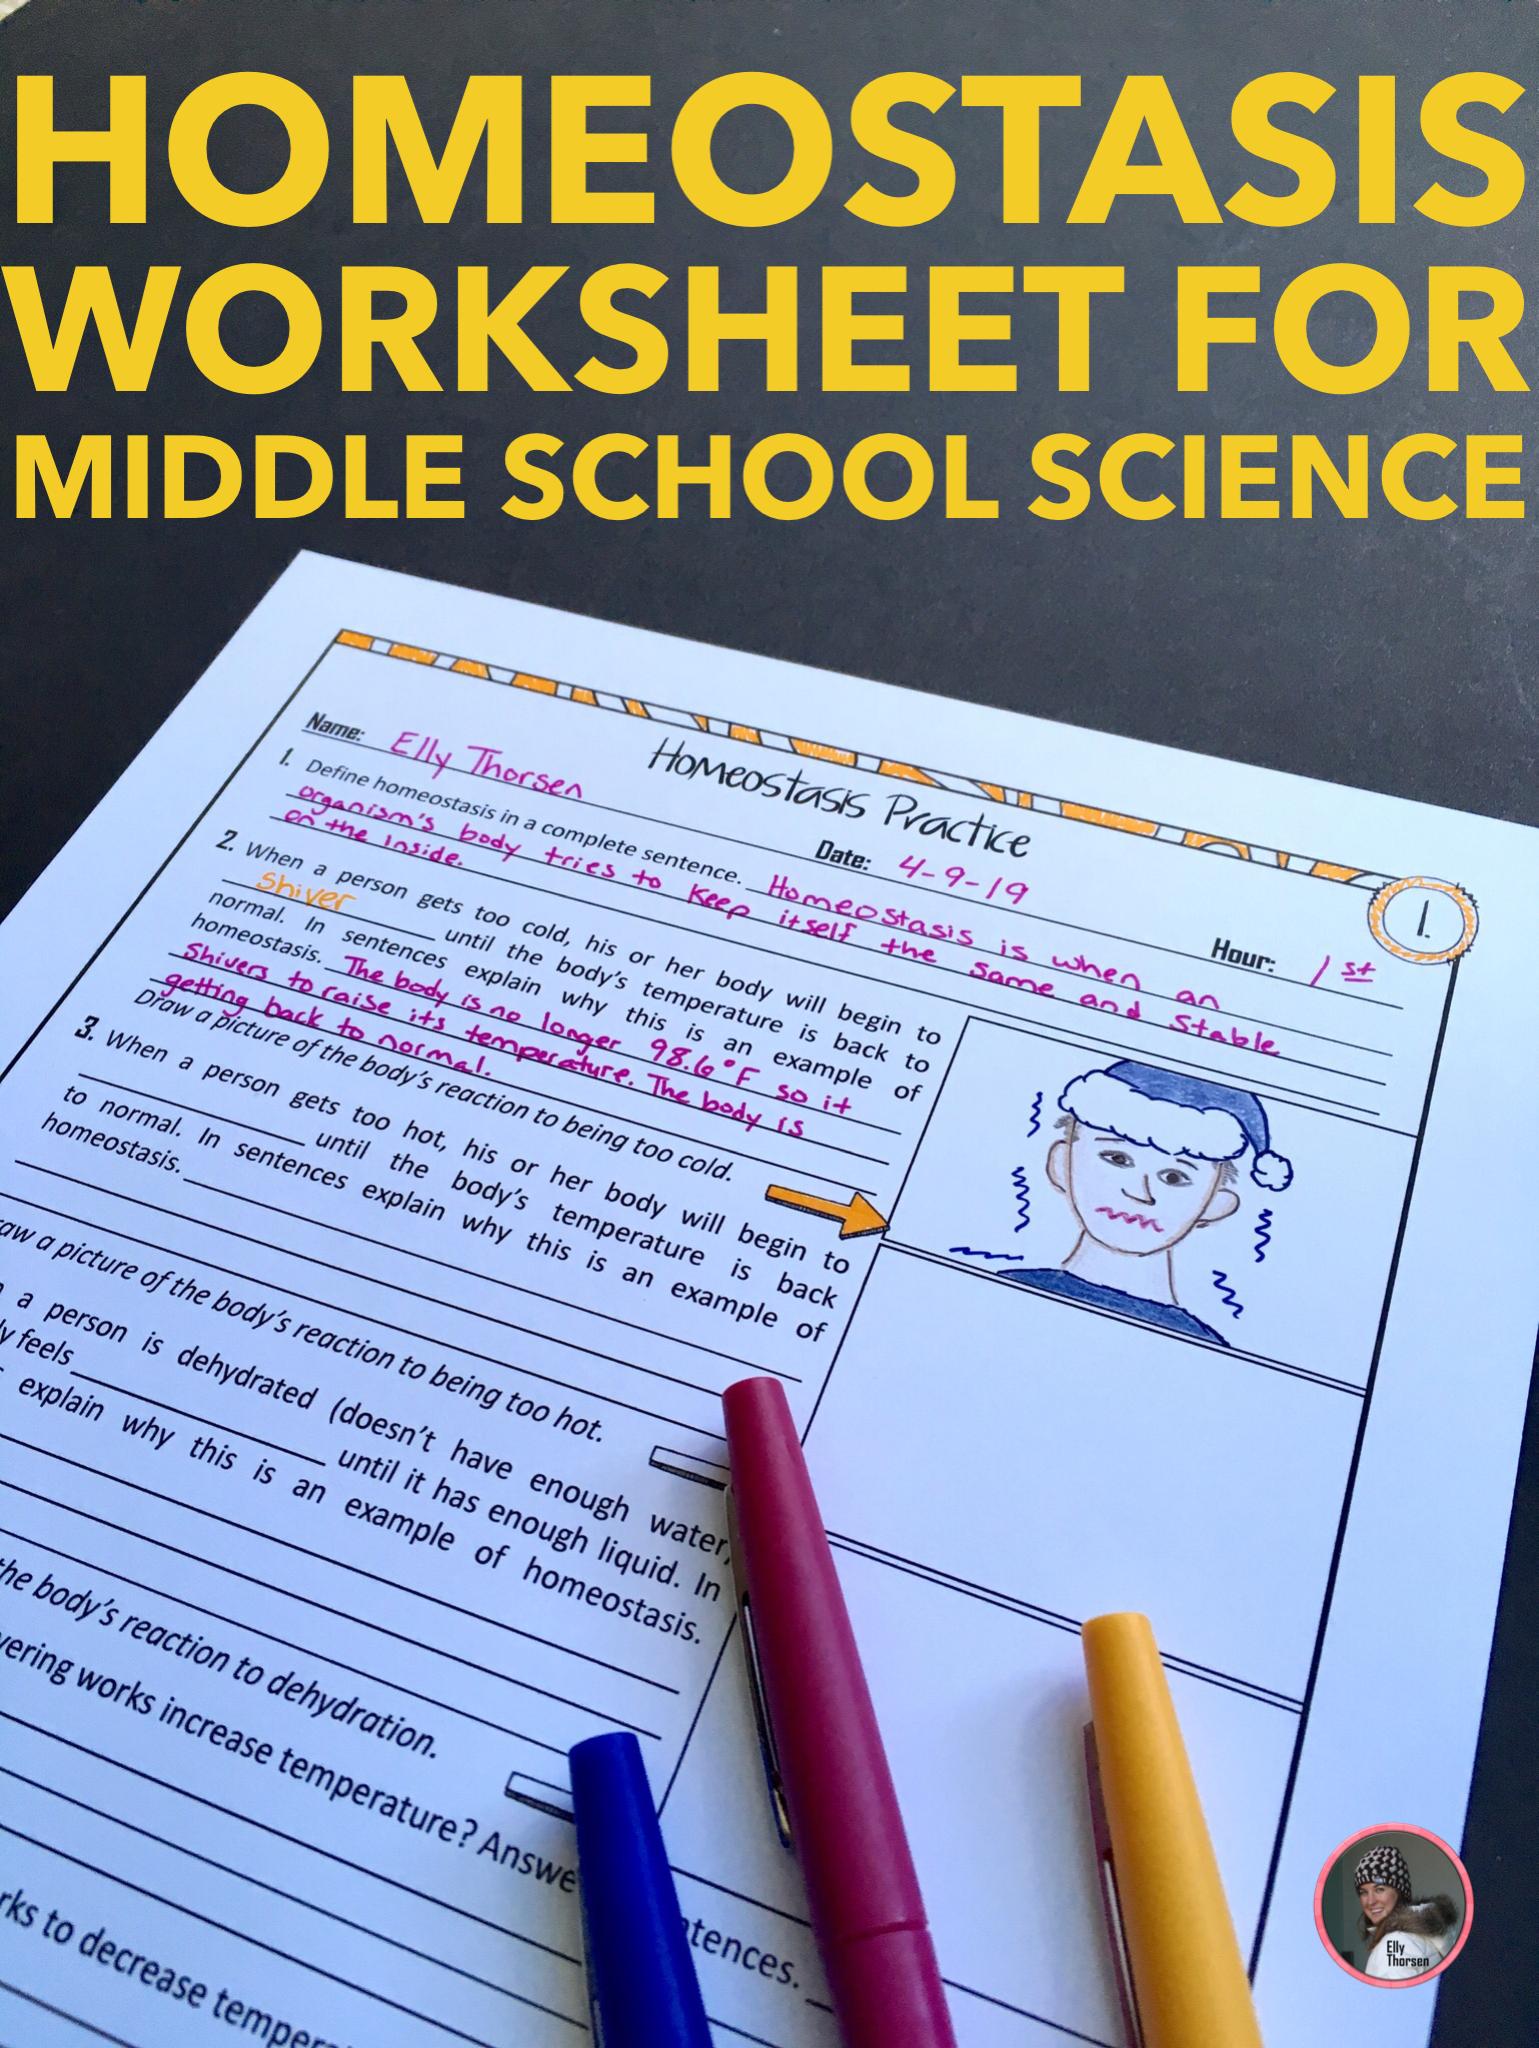 Homeostasis Practice Worksheet Middle School Science Middle School Science Projects Middle School Science Resources [ 2048 x 1539 Pixel ]